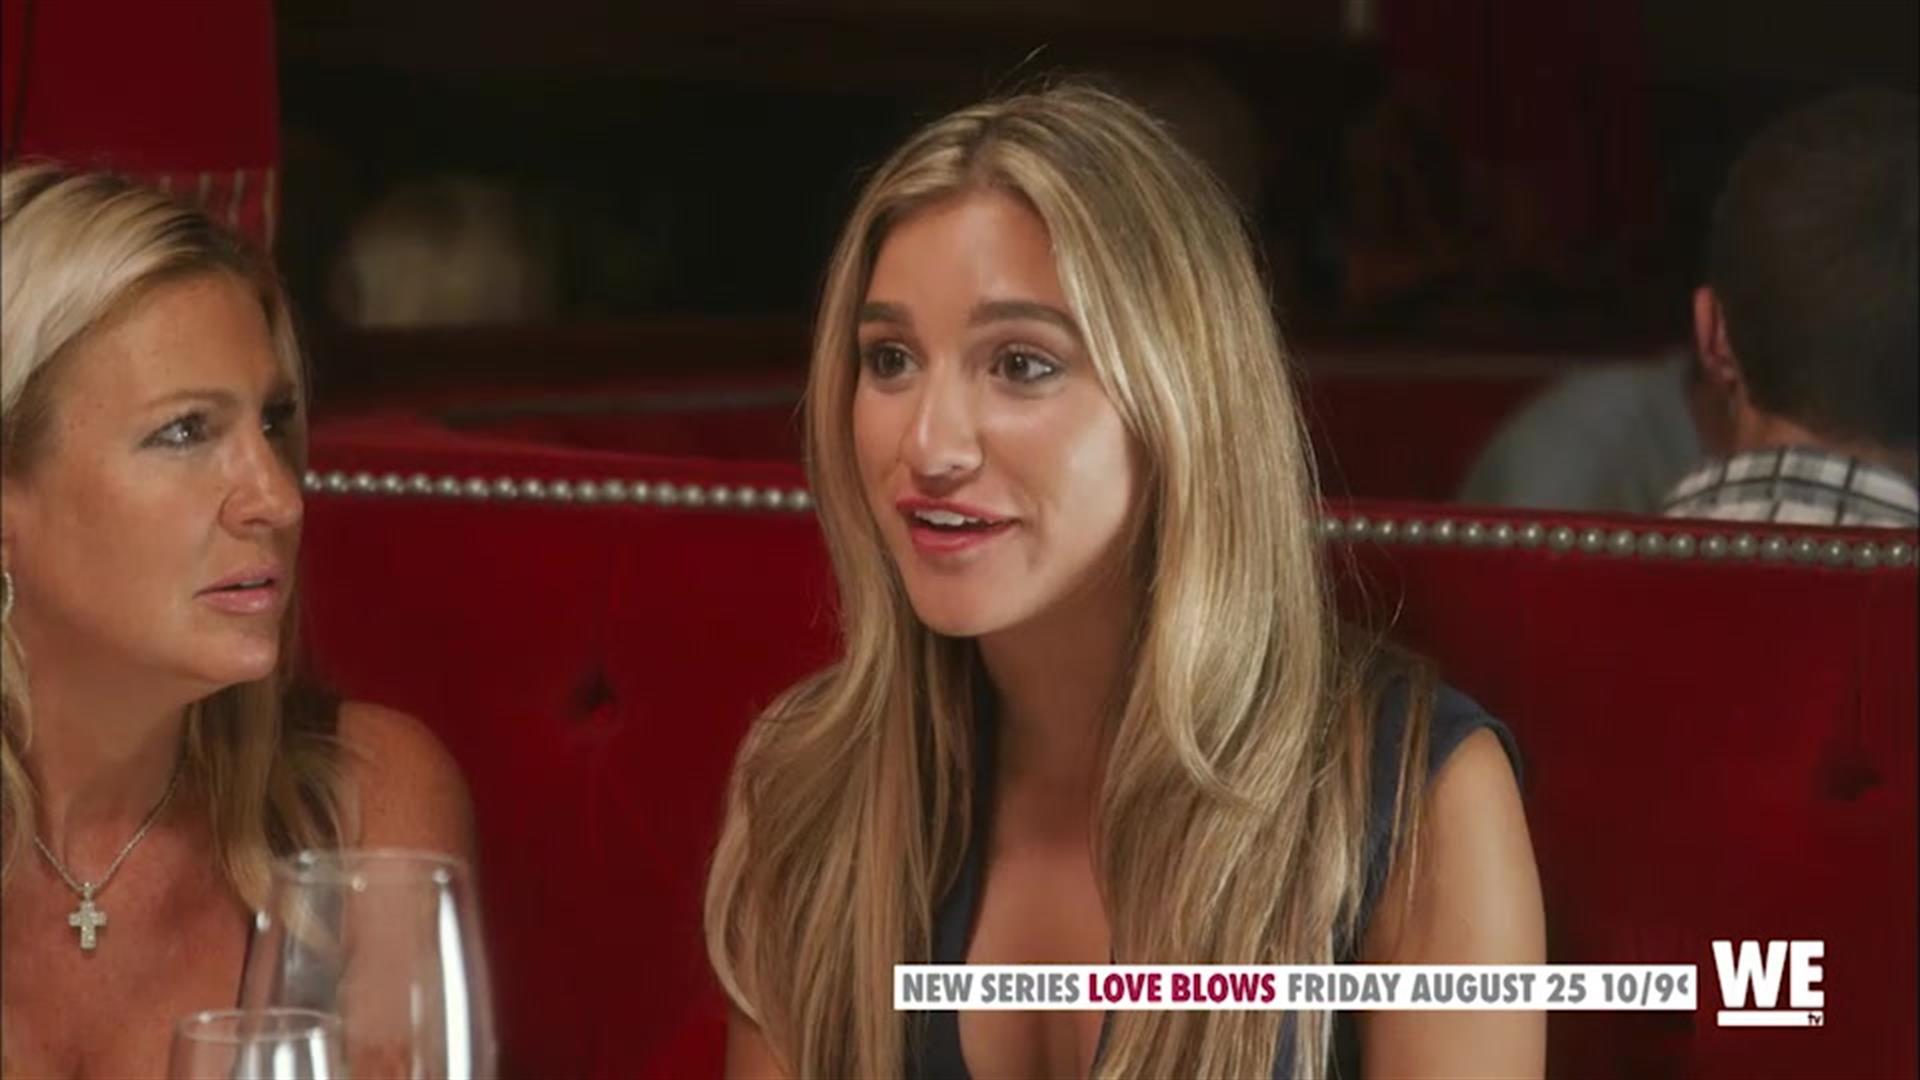 matchmaking Mamas serien som er dating Anna Popplewell